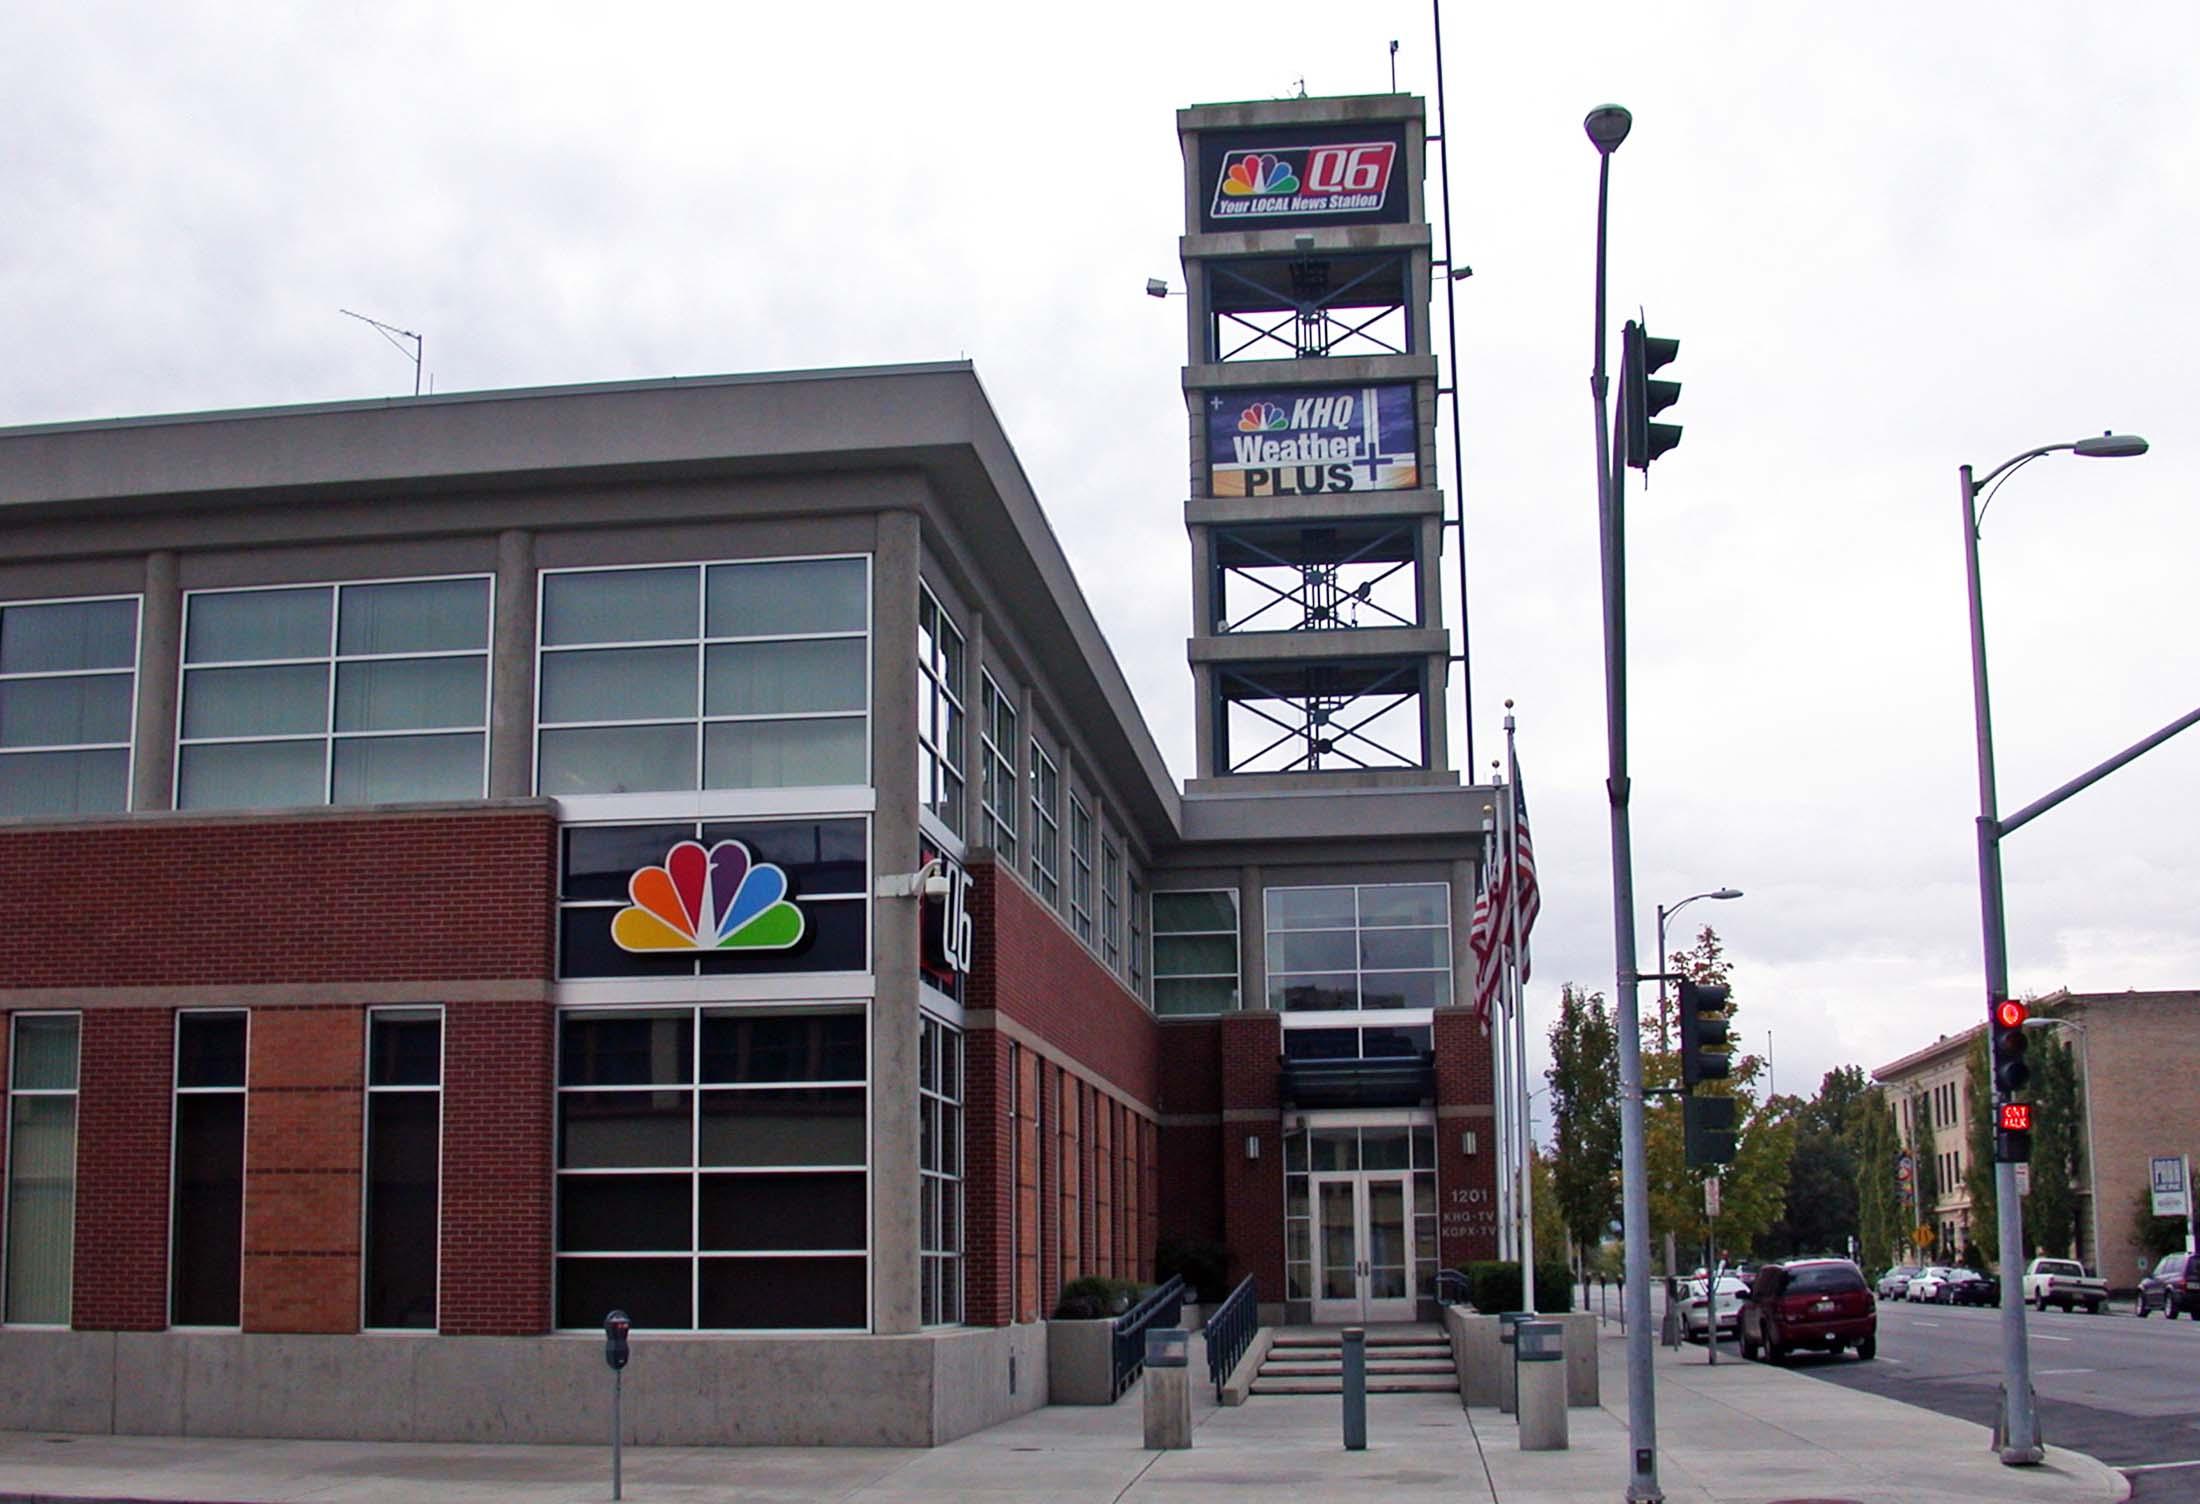 KHQ Broadcast Center, located at 1201 W. Sprague Ave. Spokane